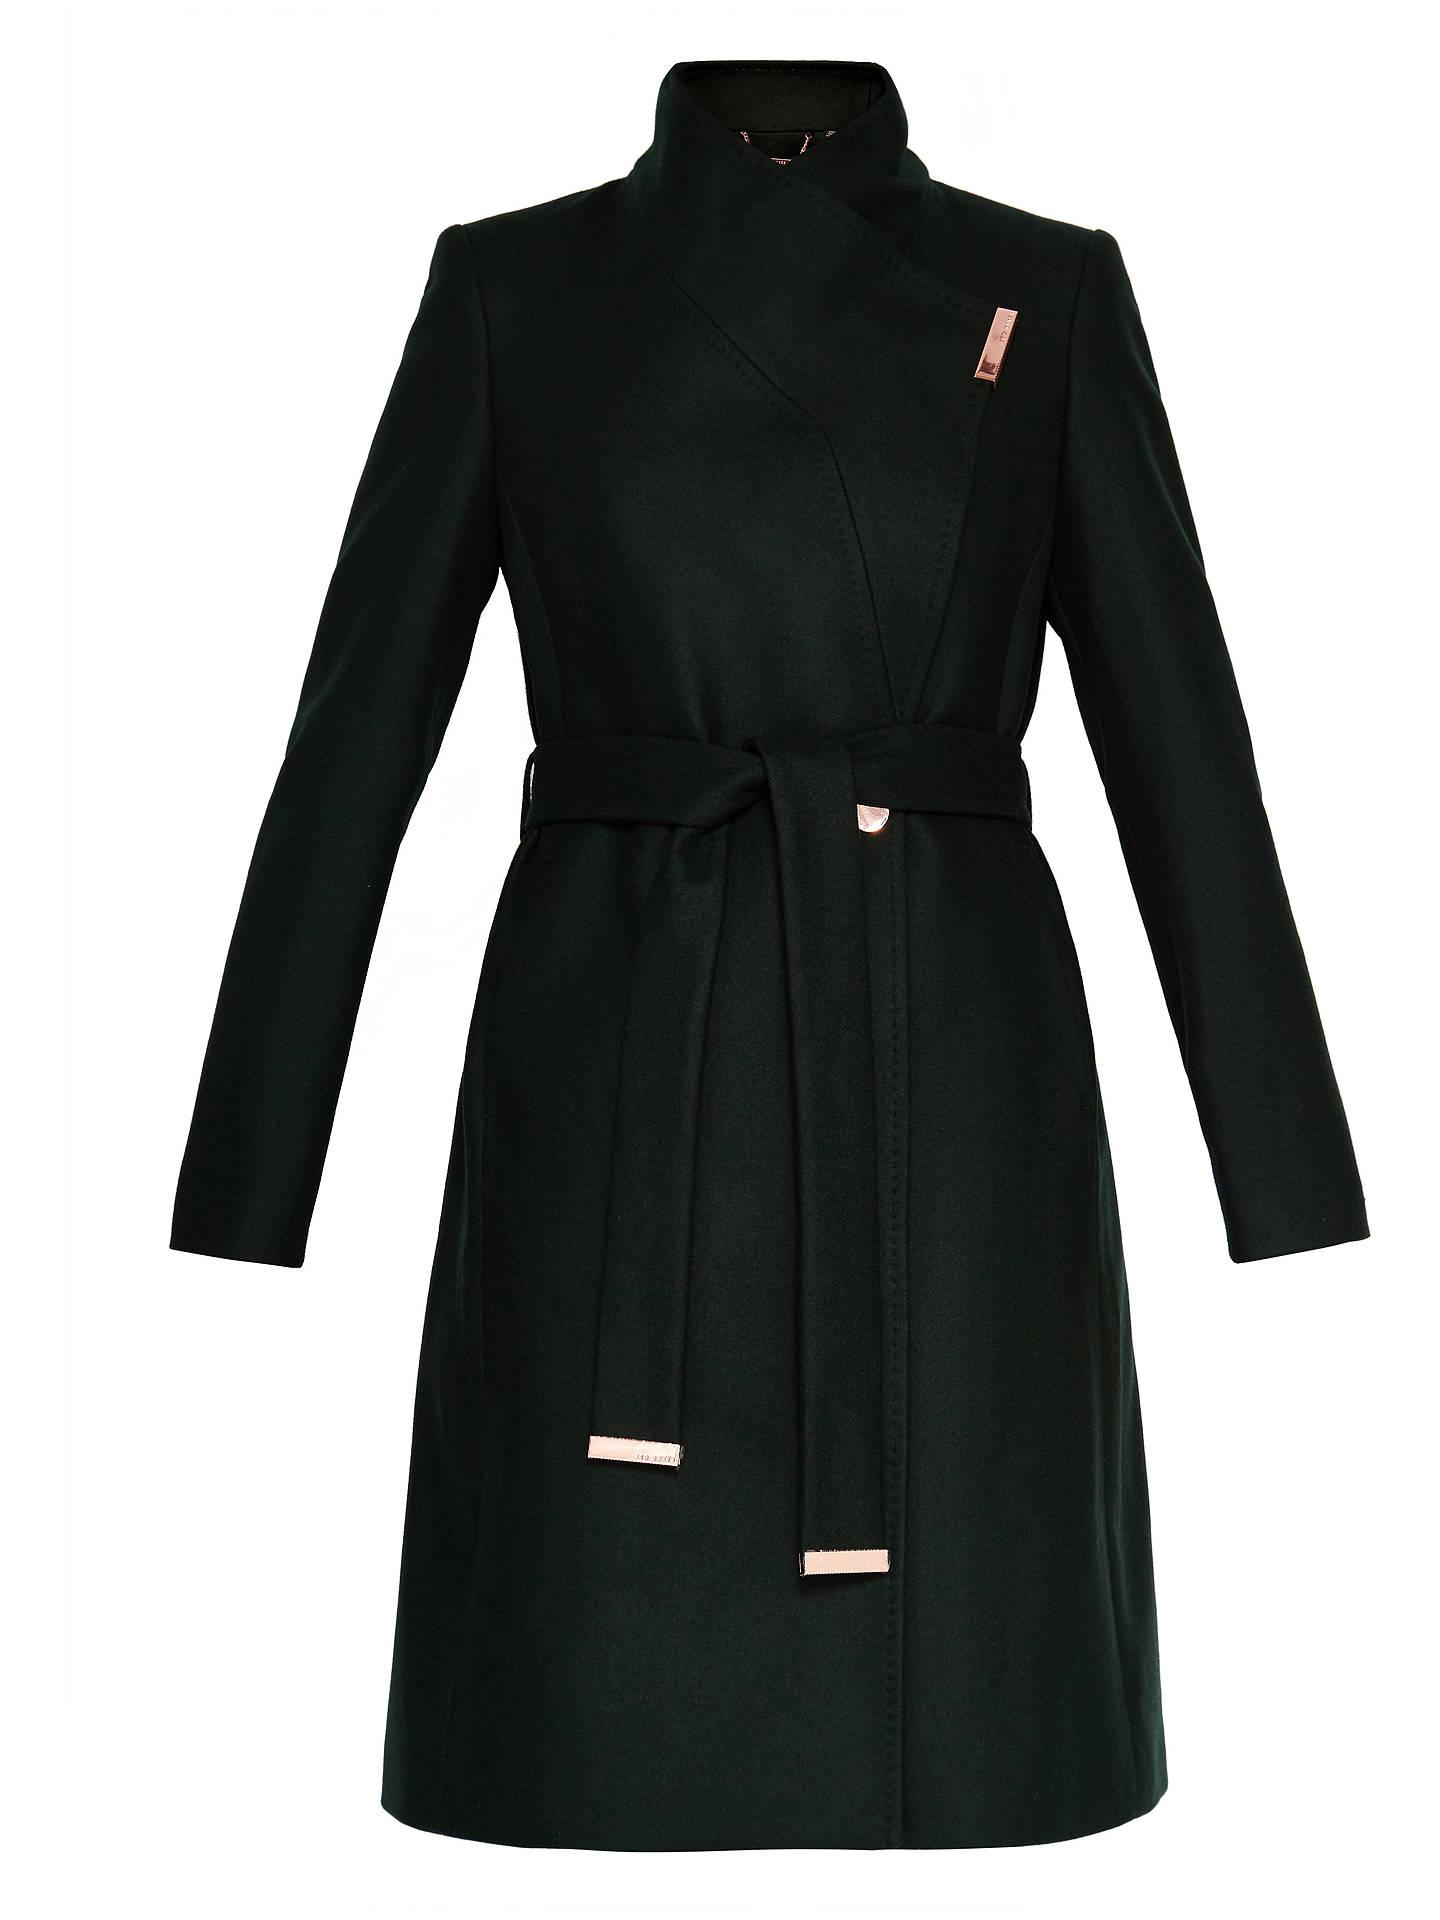 55192d2f8 Ted Baker Kikiie Wrap Front Coat at John Lewis   Partners